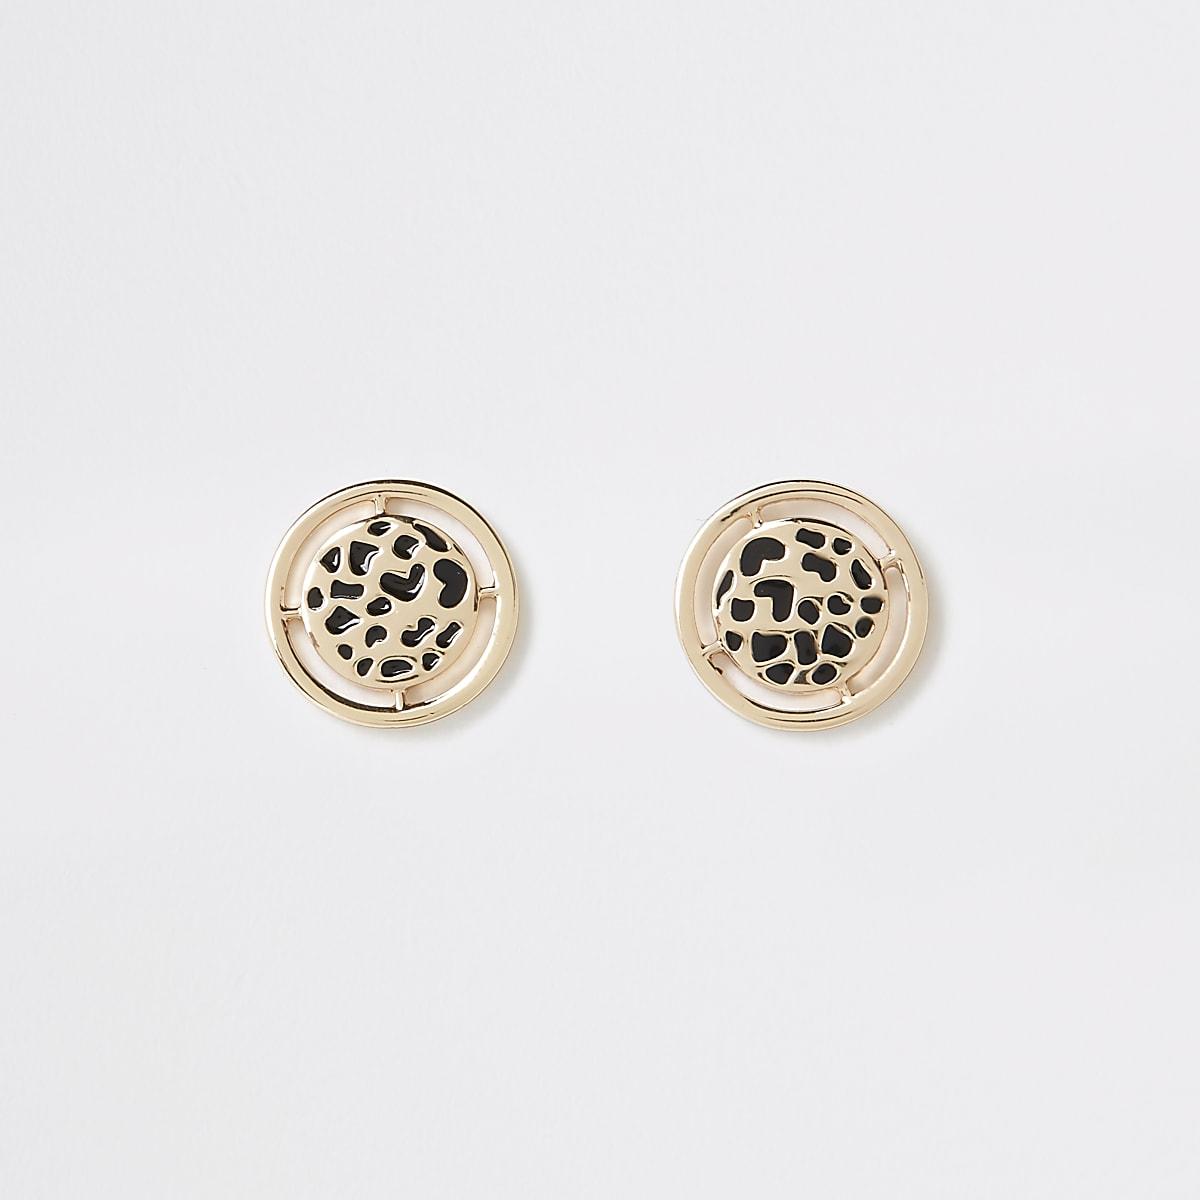 Gold color leopard design stud earrings